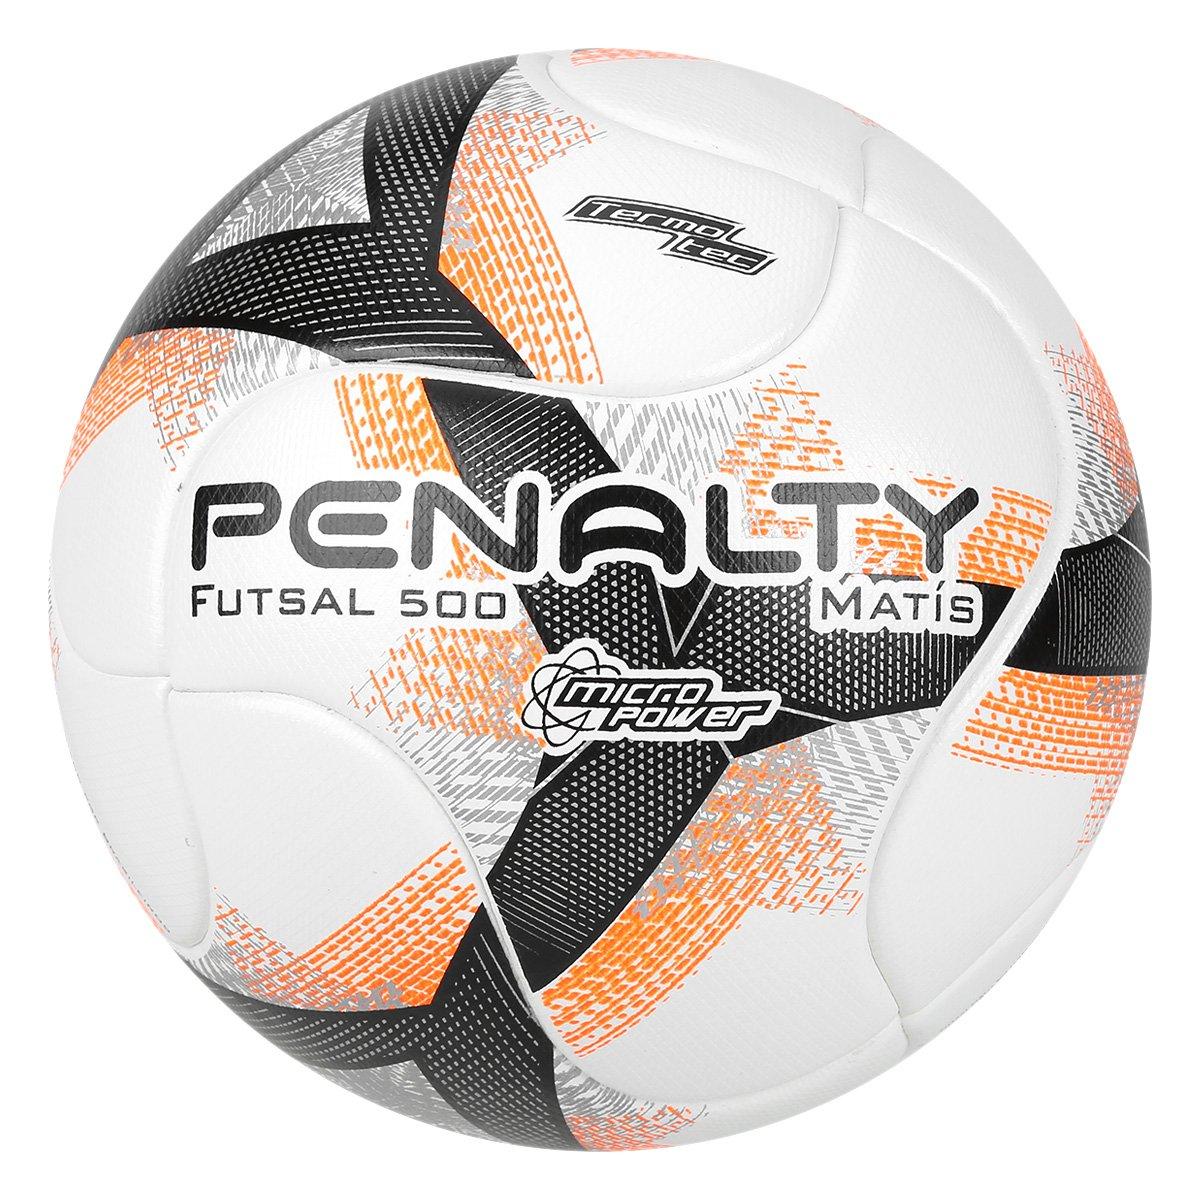 0eb1c05290bb1 Bola Futsal Penalty Matis 500 Termotec VIII